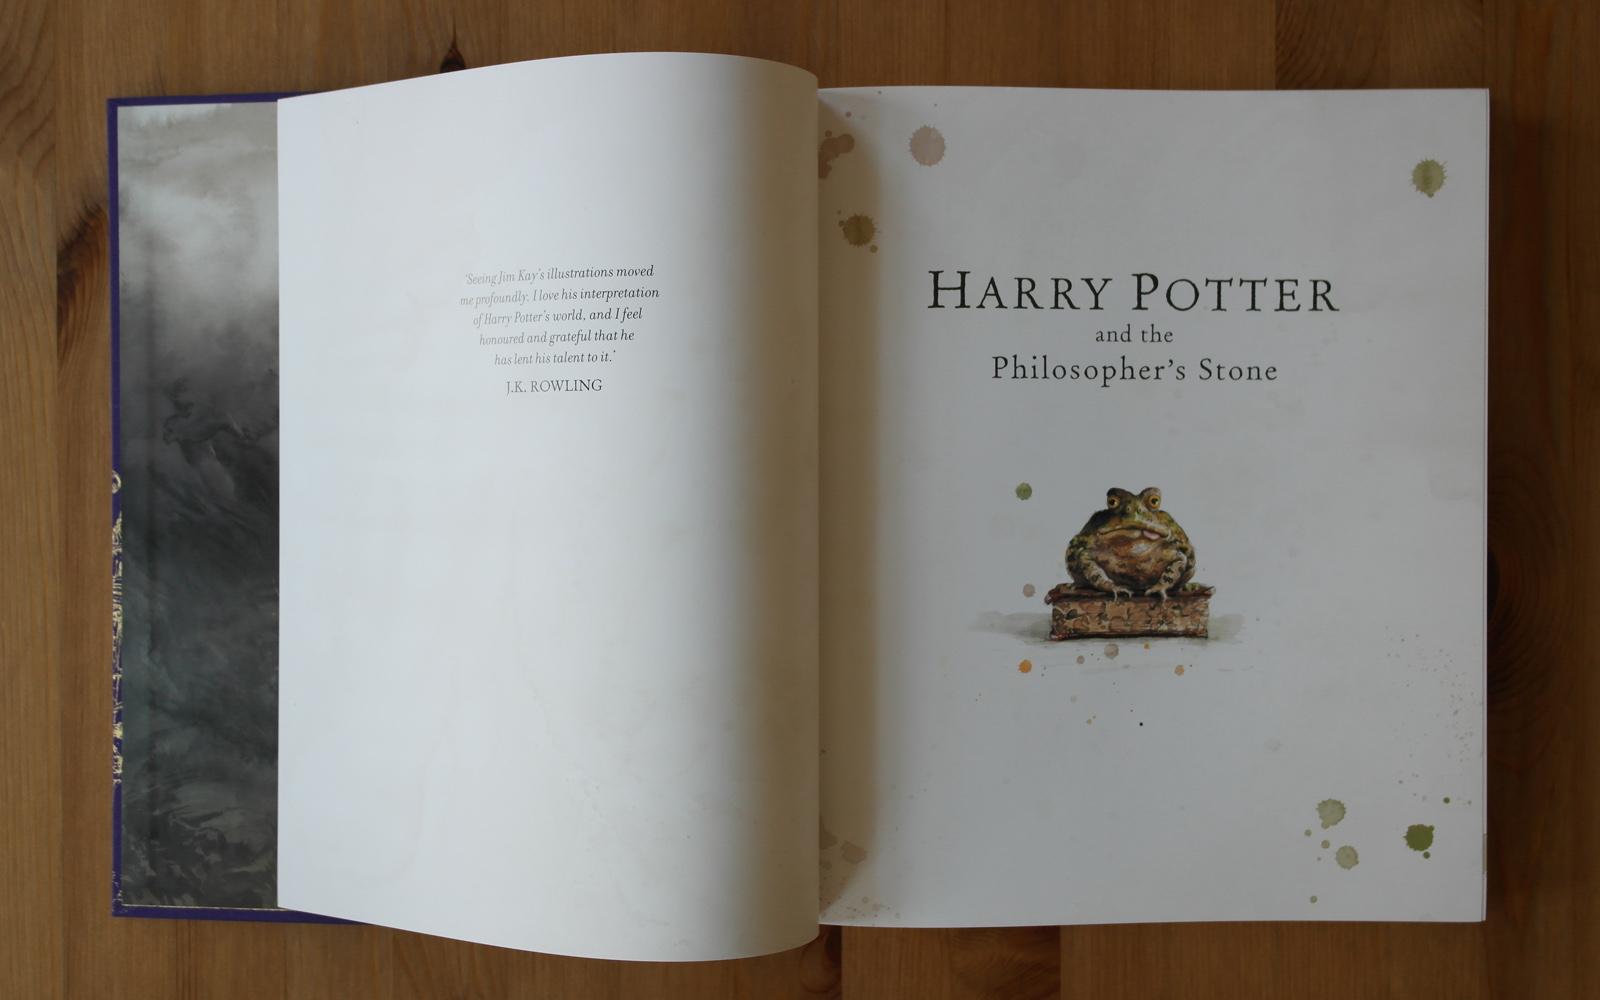 HarryPotter02